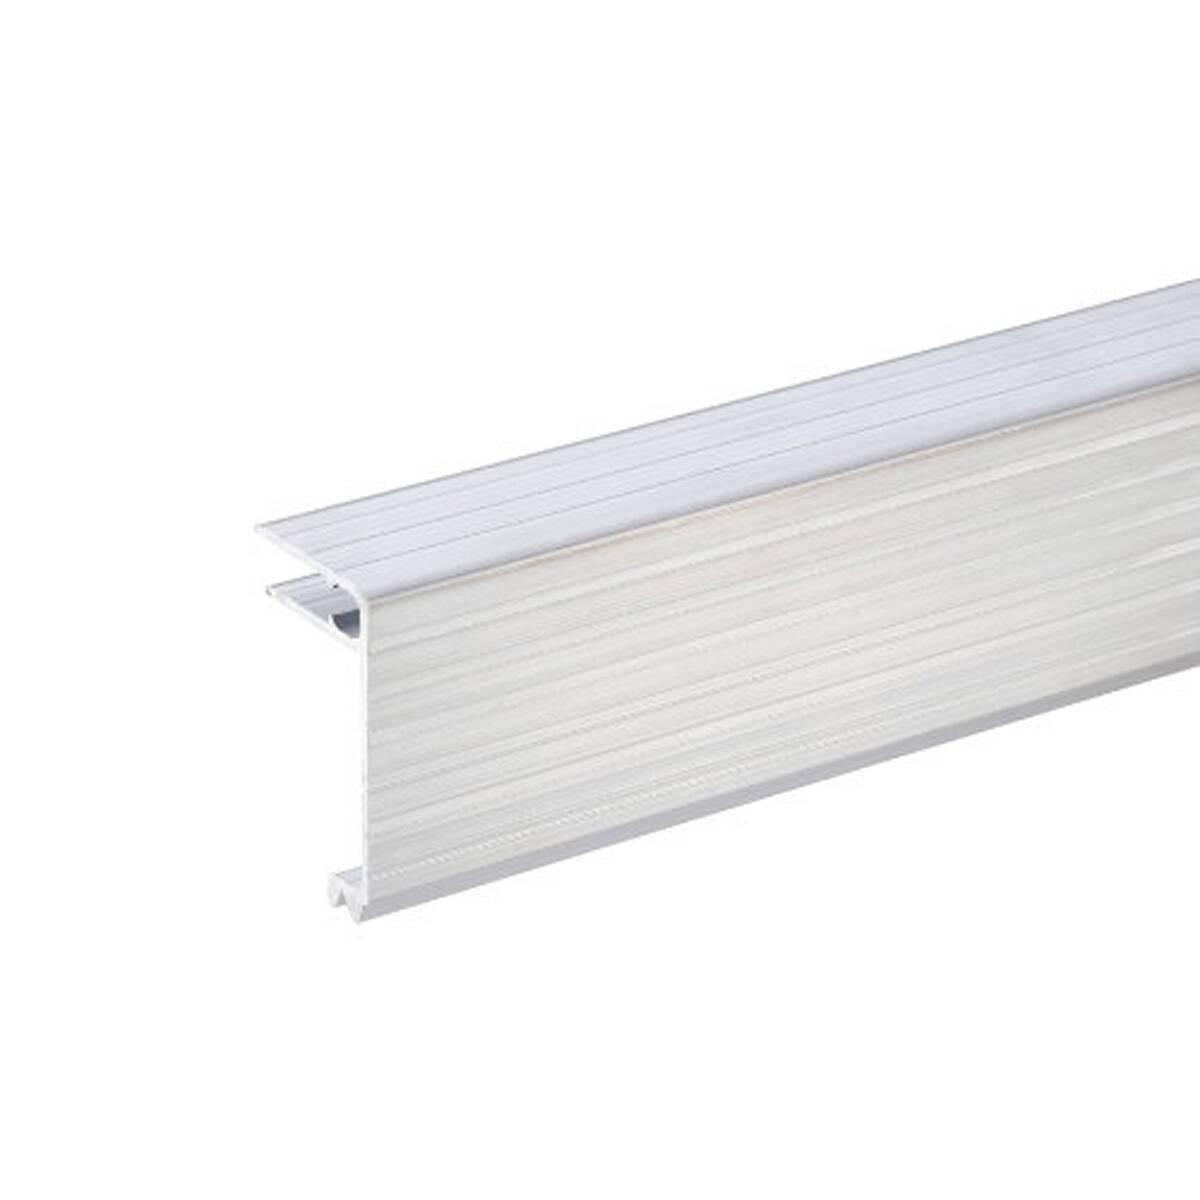 adam hall 6116 aluminium deckelrahmen 48 mm 7 mm einschub. Black Bedroom Furniture Sets. Home Design Ideas